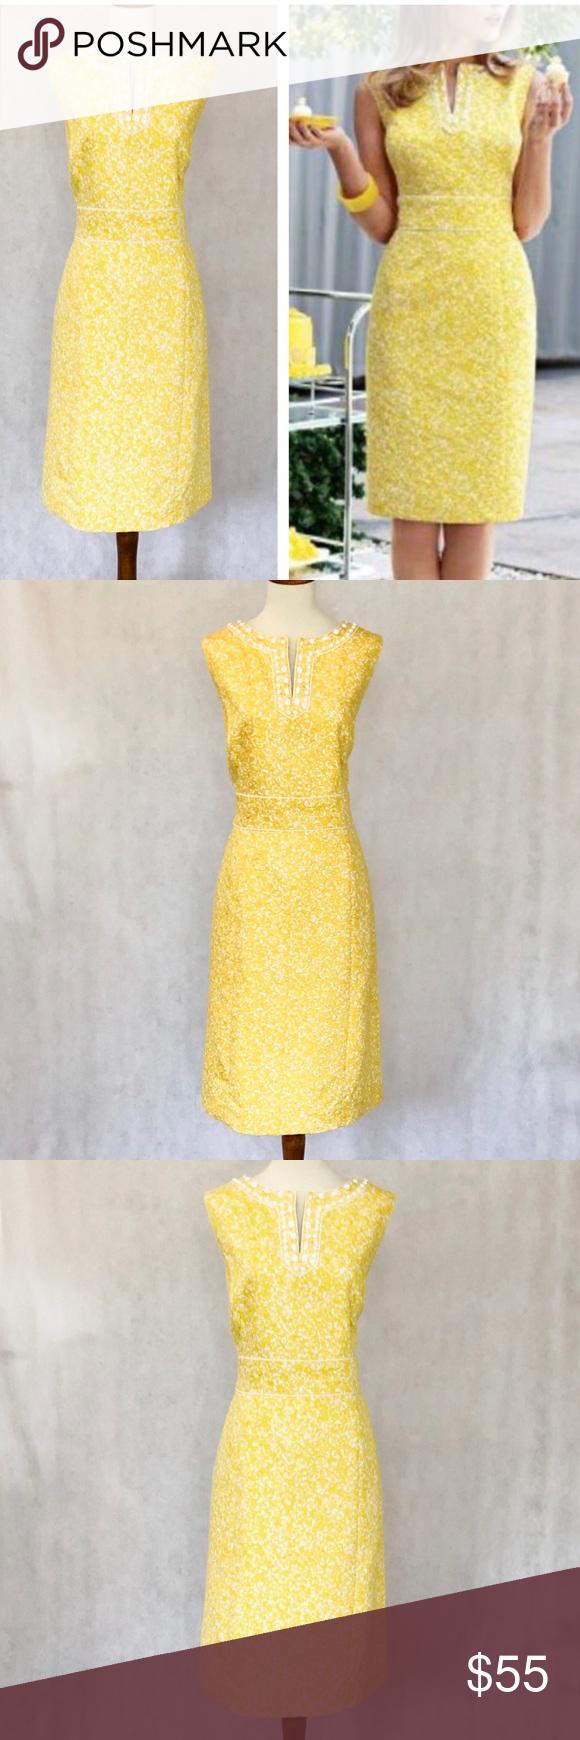 Tahari Yellow White Floral Beaded Neck Dress Dresses Neck Dress Tahari Dress [ 1740 x 580 Pixel ]